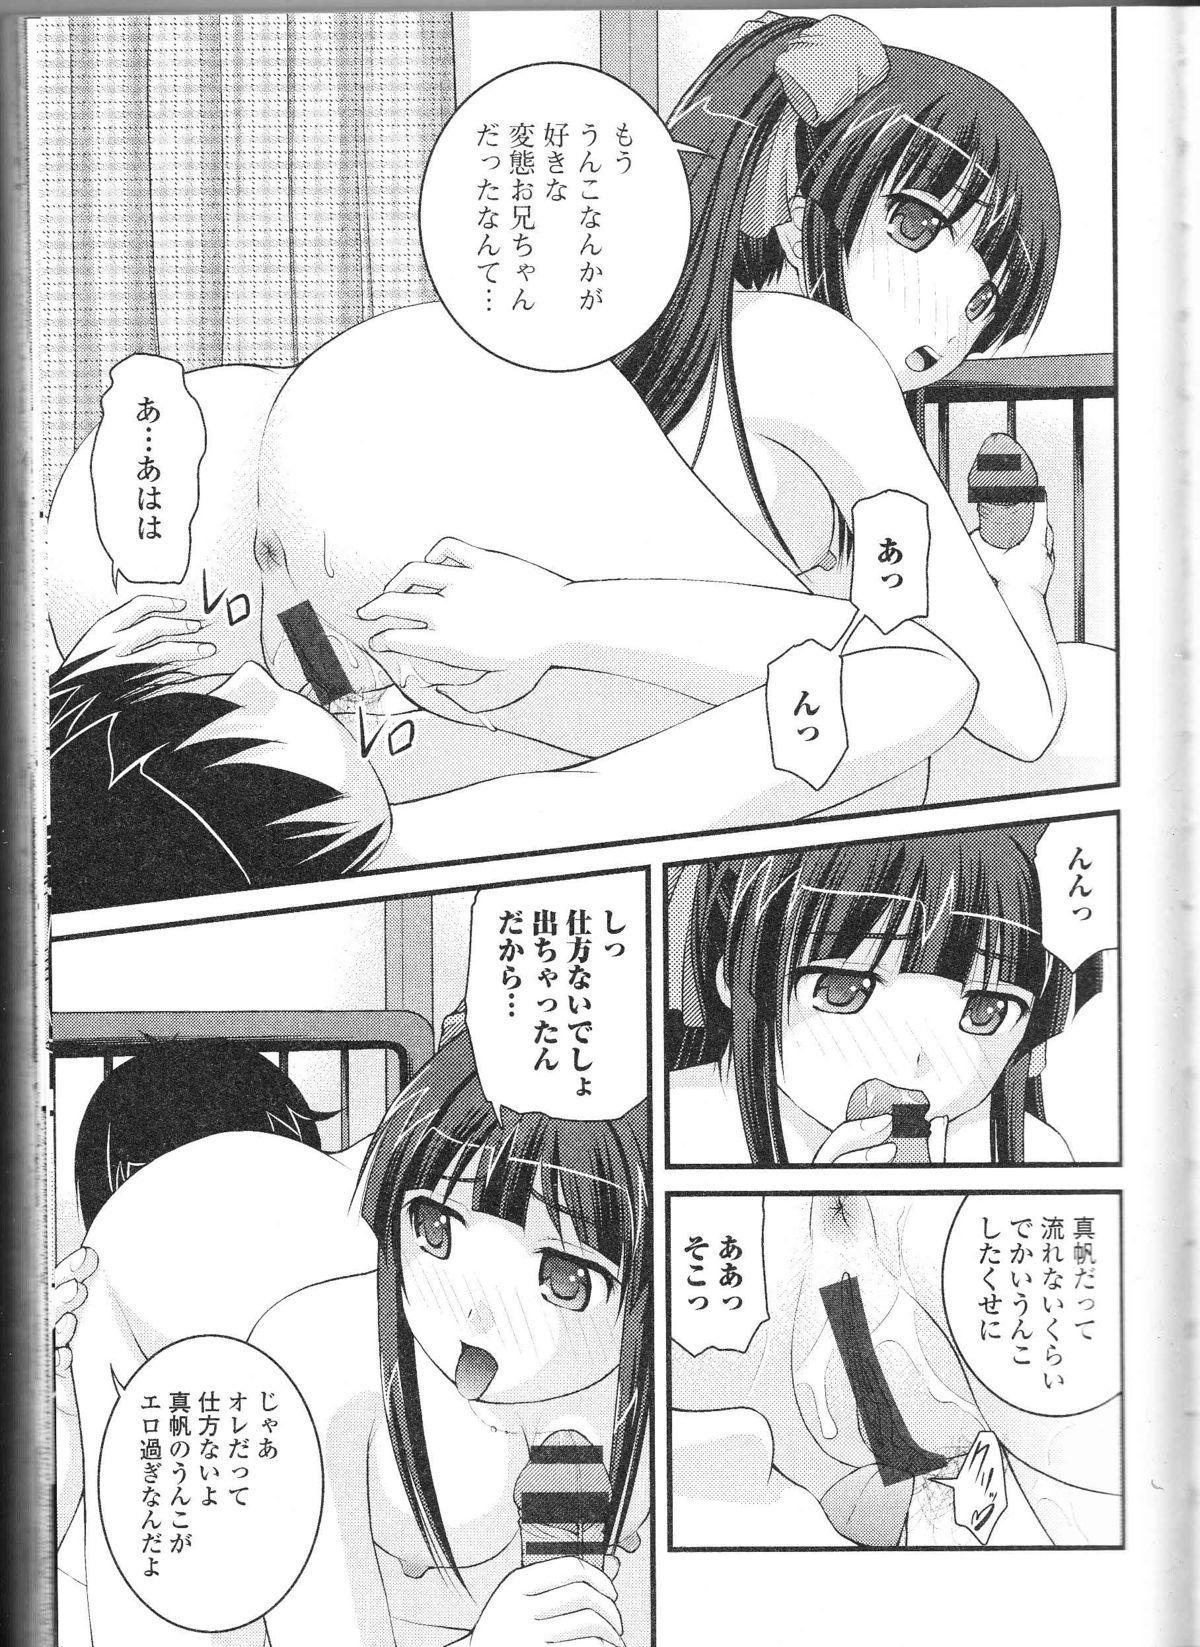 Nozoite wa Ikenai 9 - Do Not Peep! 9 15